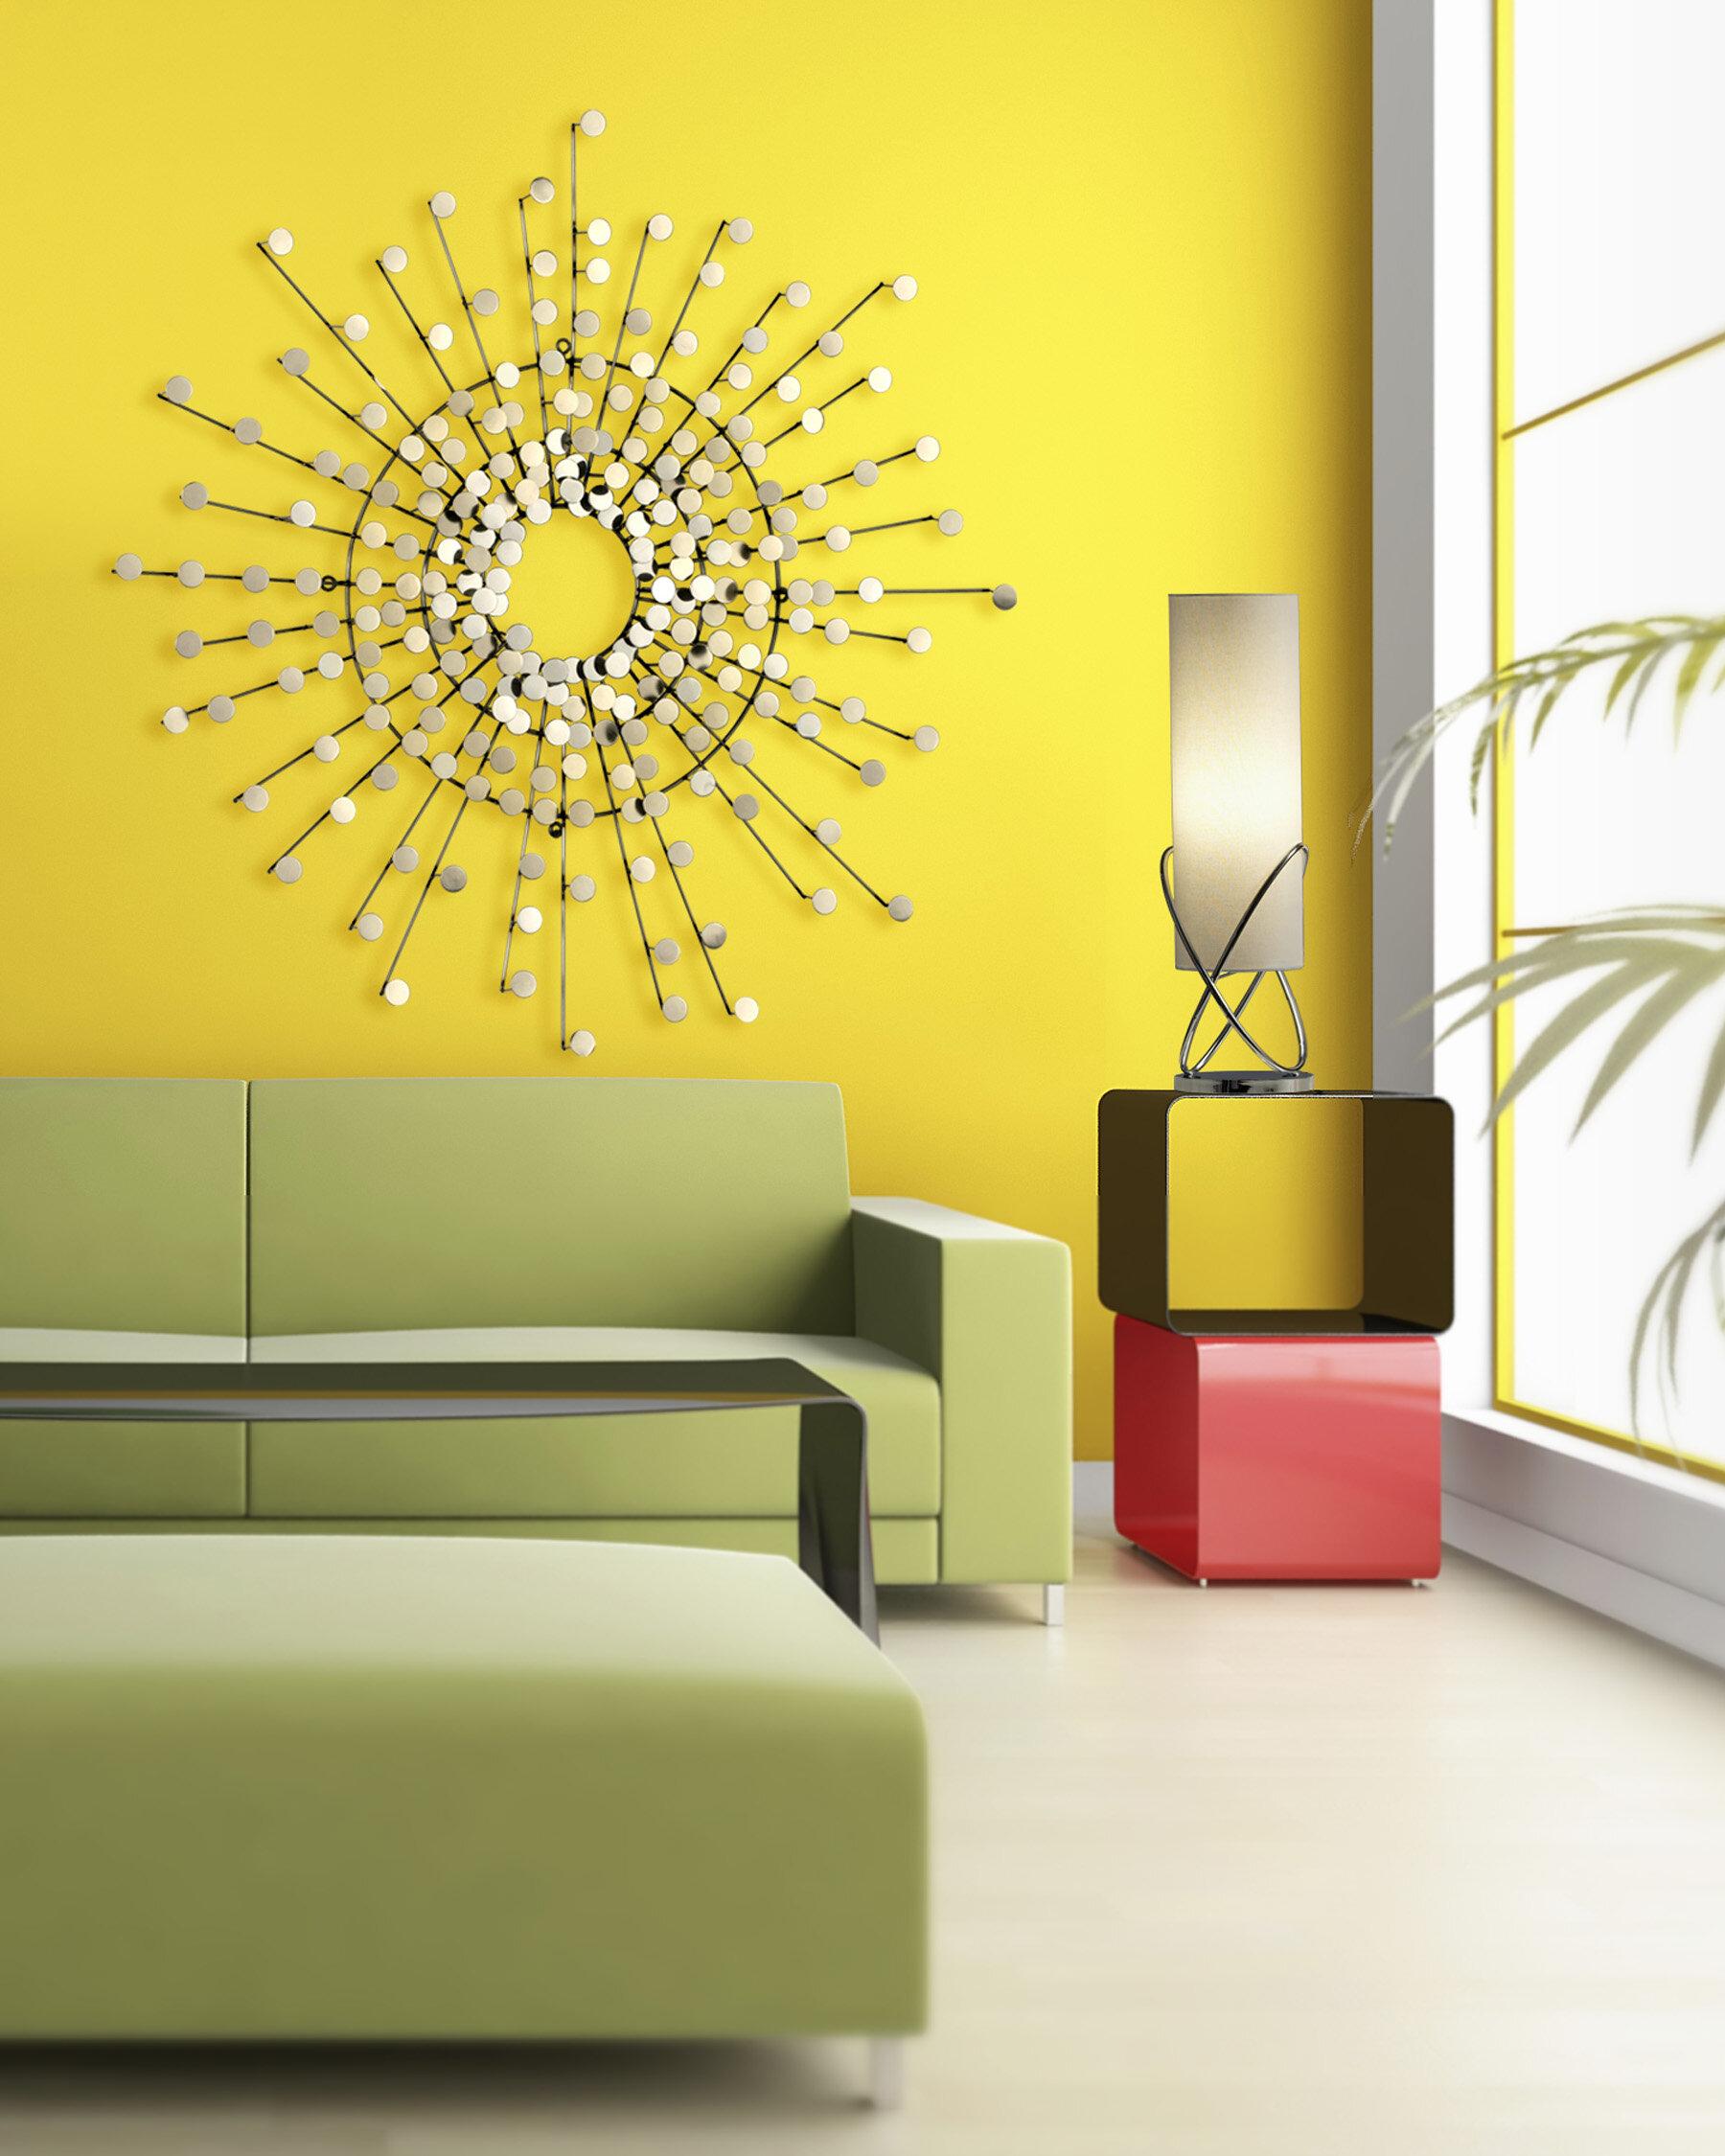 Attractive Scoppio Wall Decor Frieze - The Wall Art Decorations ...